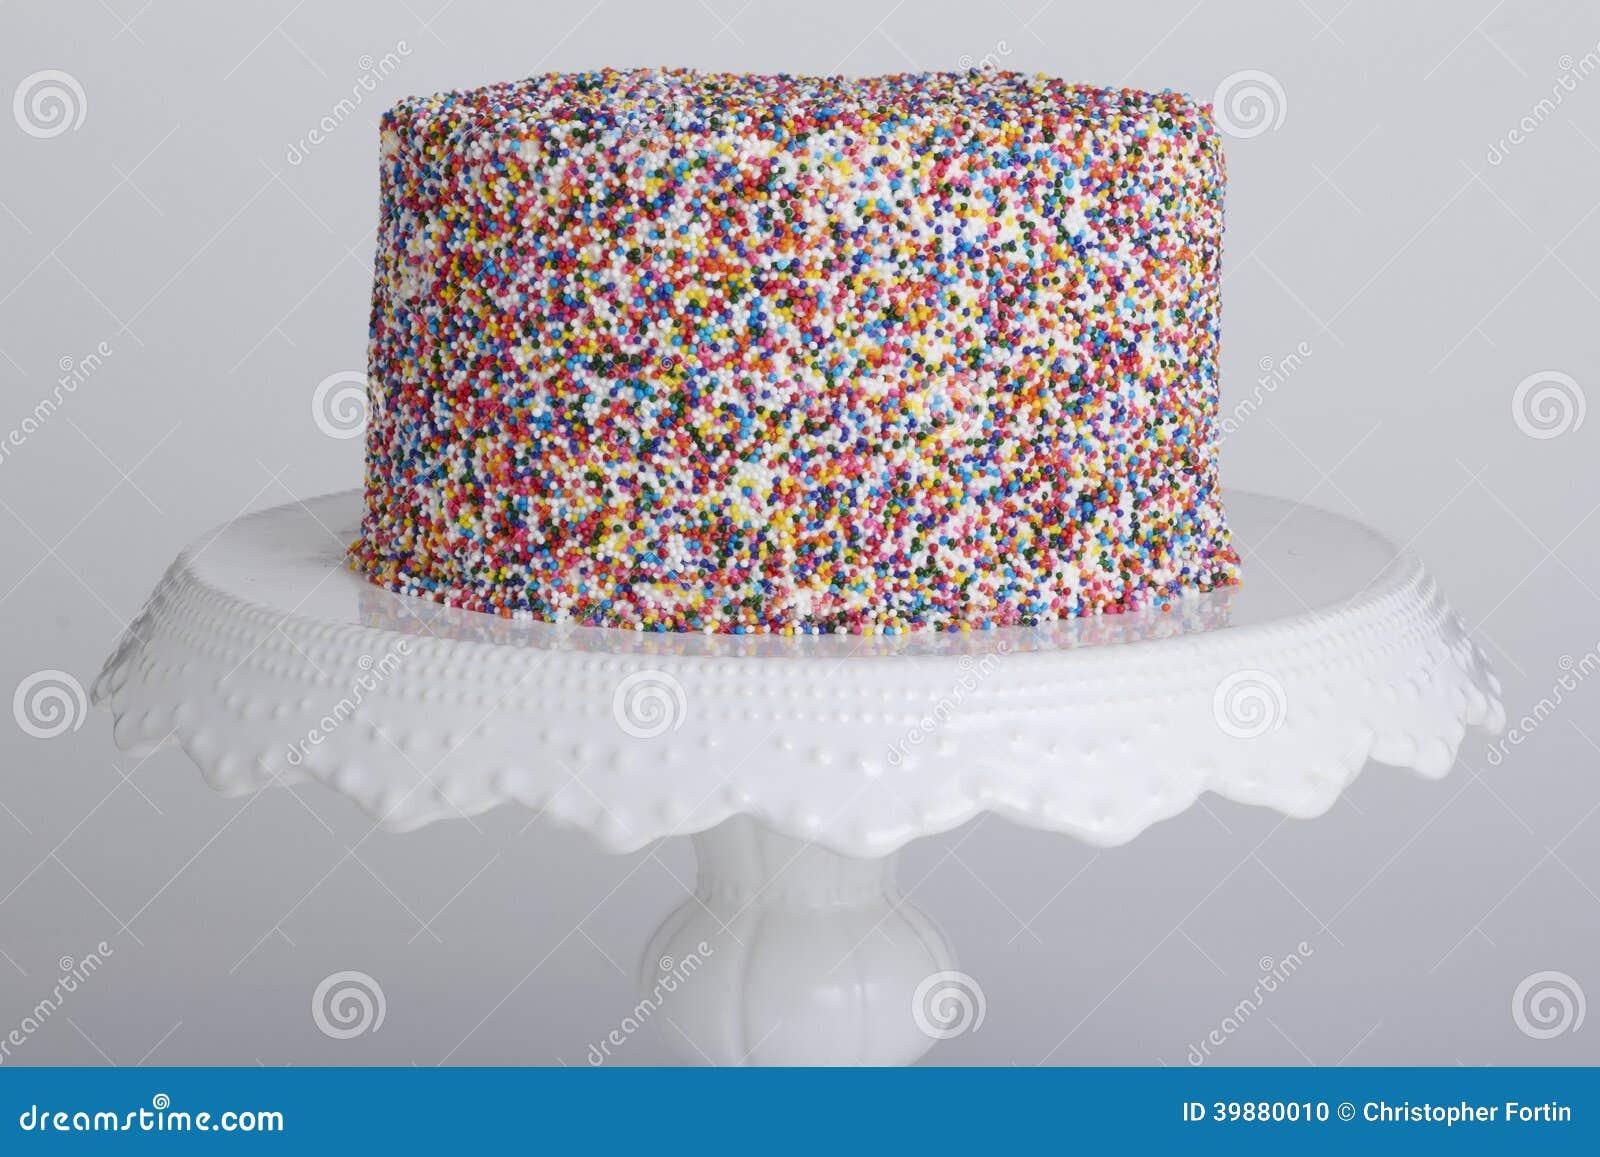 Cake With Sprinkles Stock Photo Image 39880010